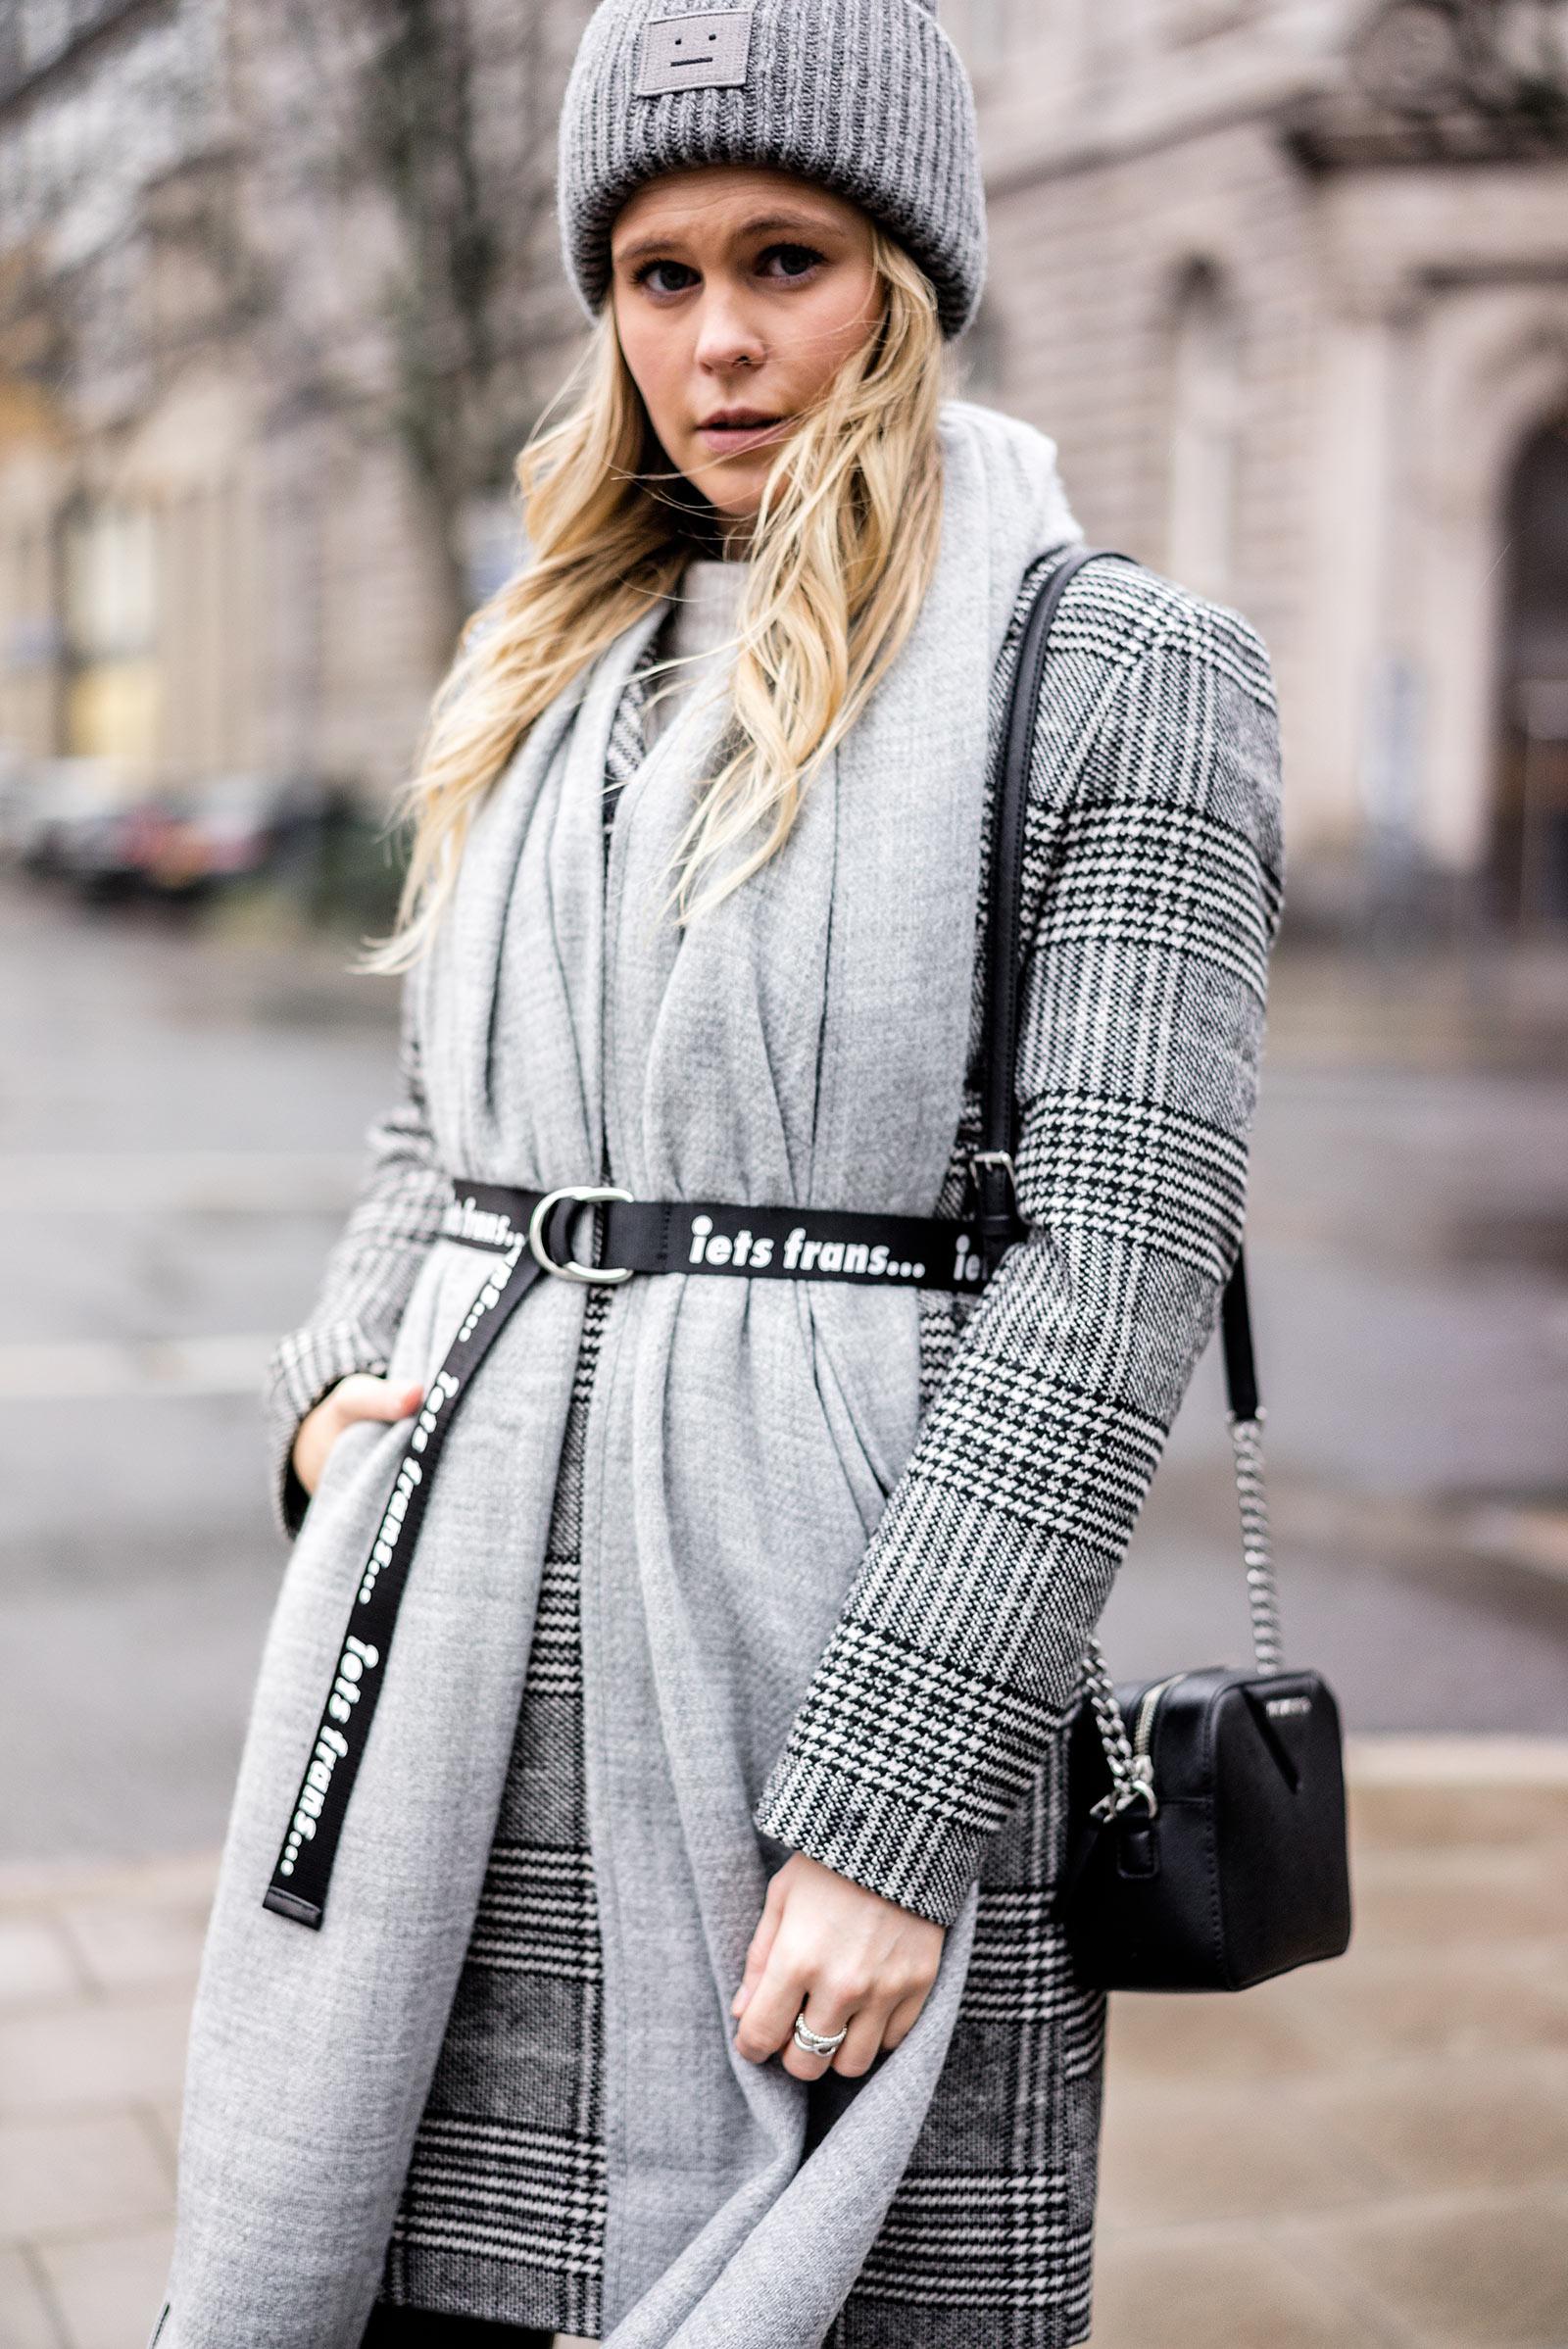 Outfit Winter-Accessoires Gürtel über Mantel Sunnyinga Bloggerin